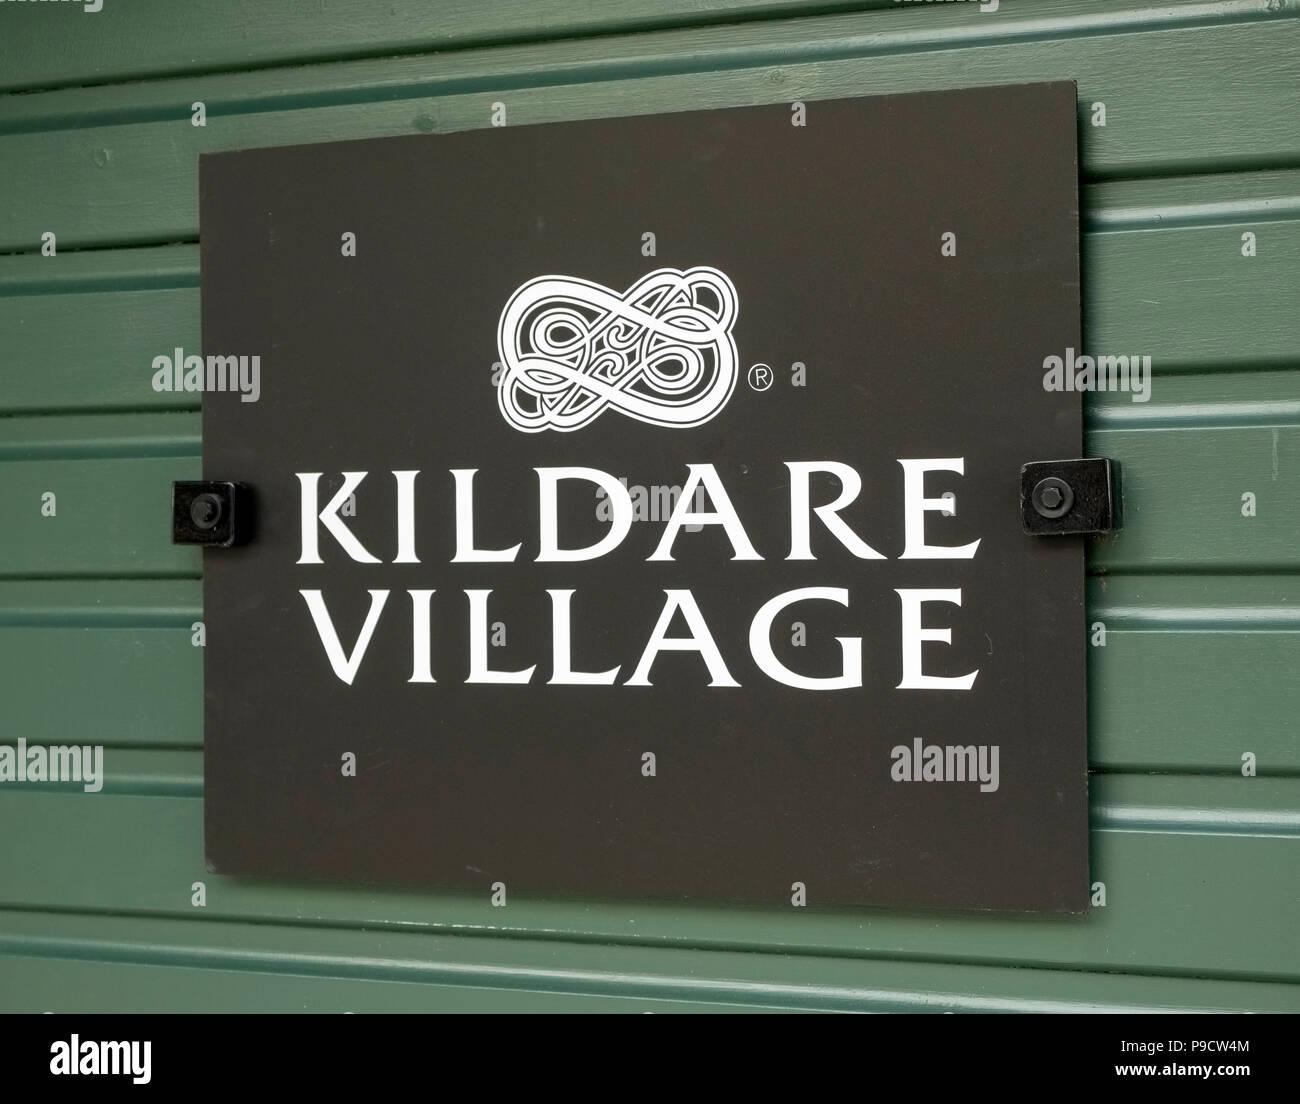 Kildare Village Shopping Outlet logo, Ireland, Europe - Stock Image